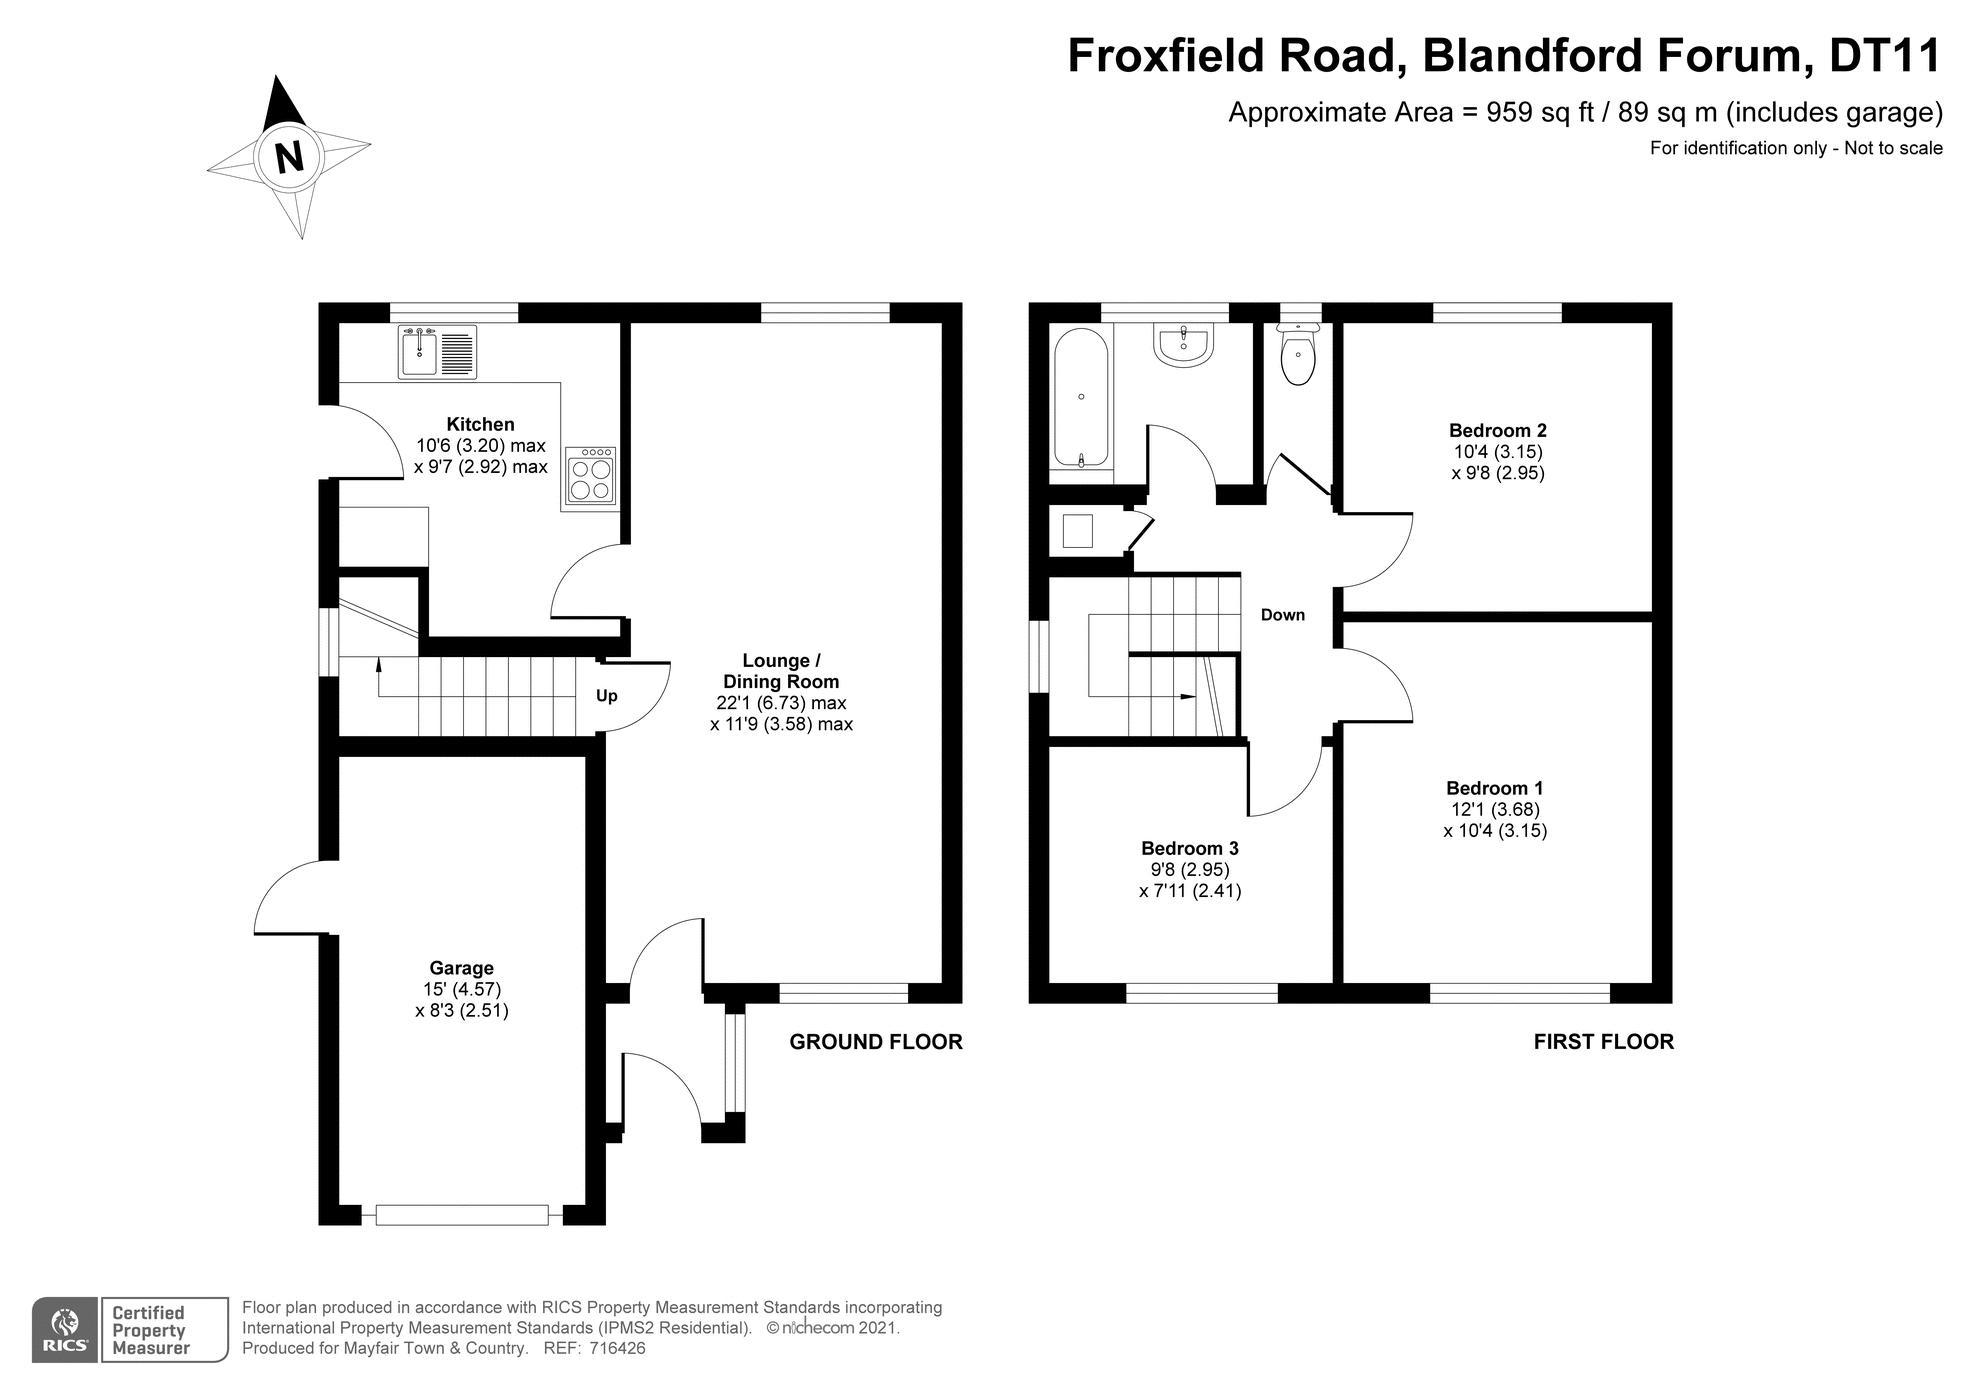 Froxfield Road